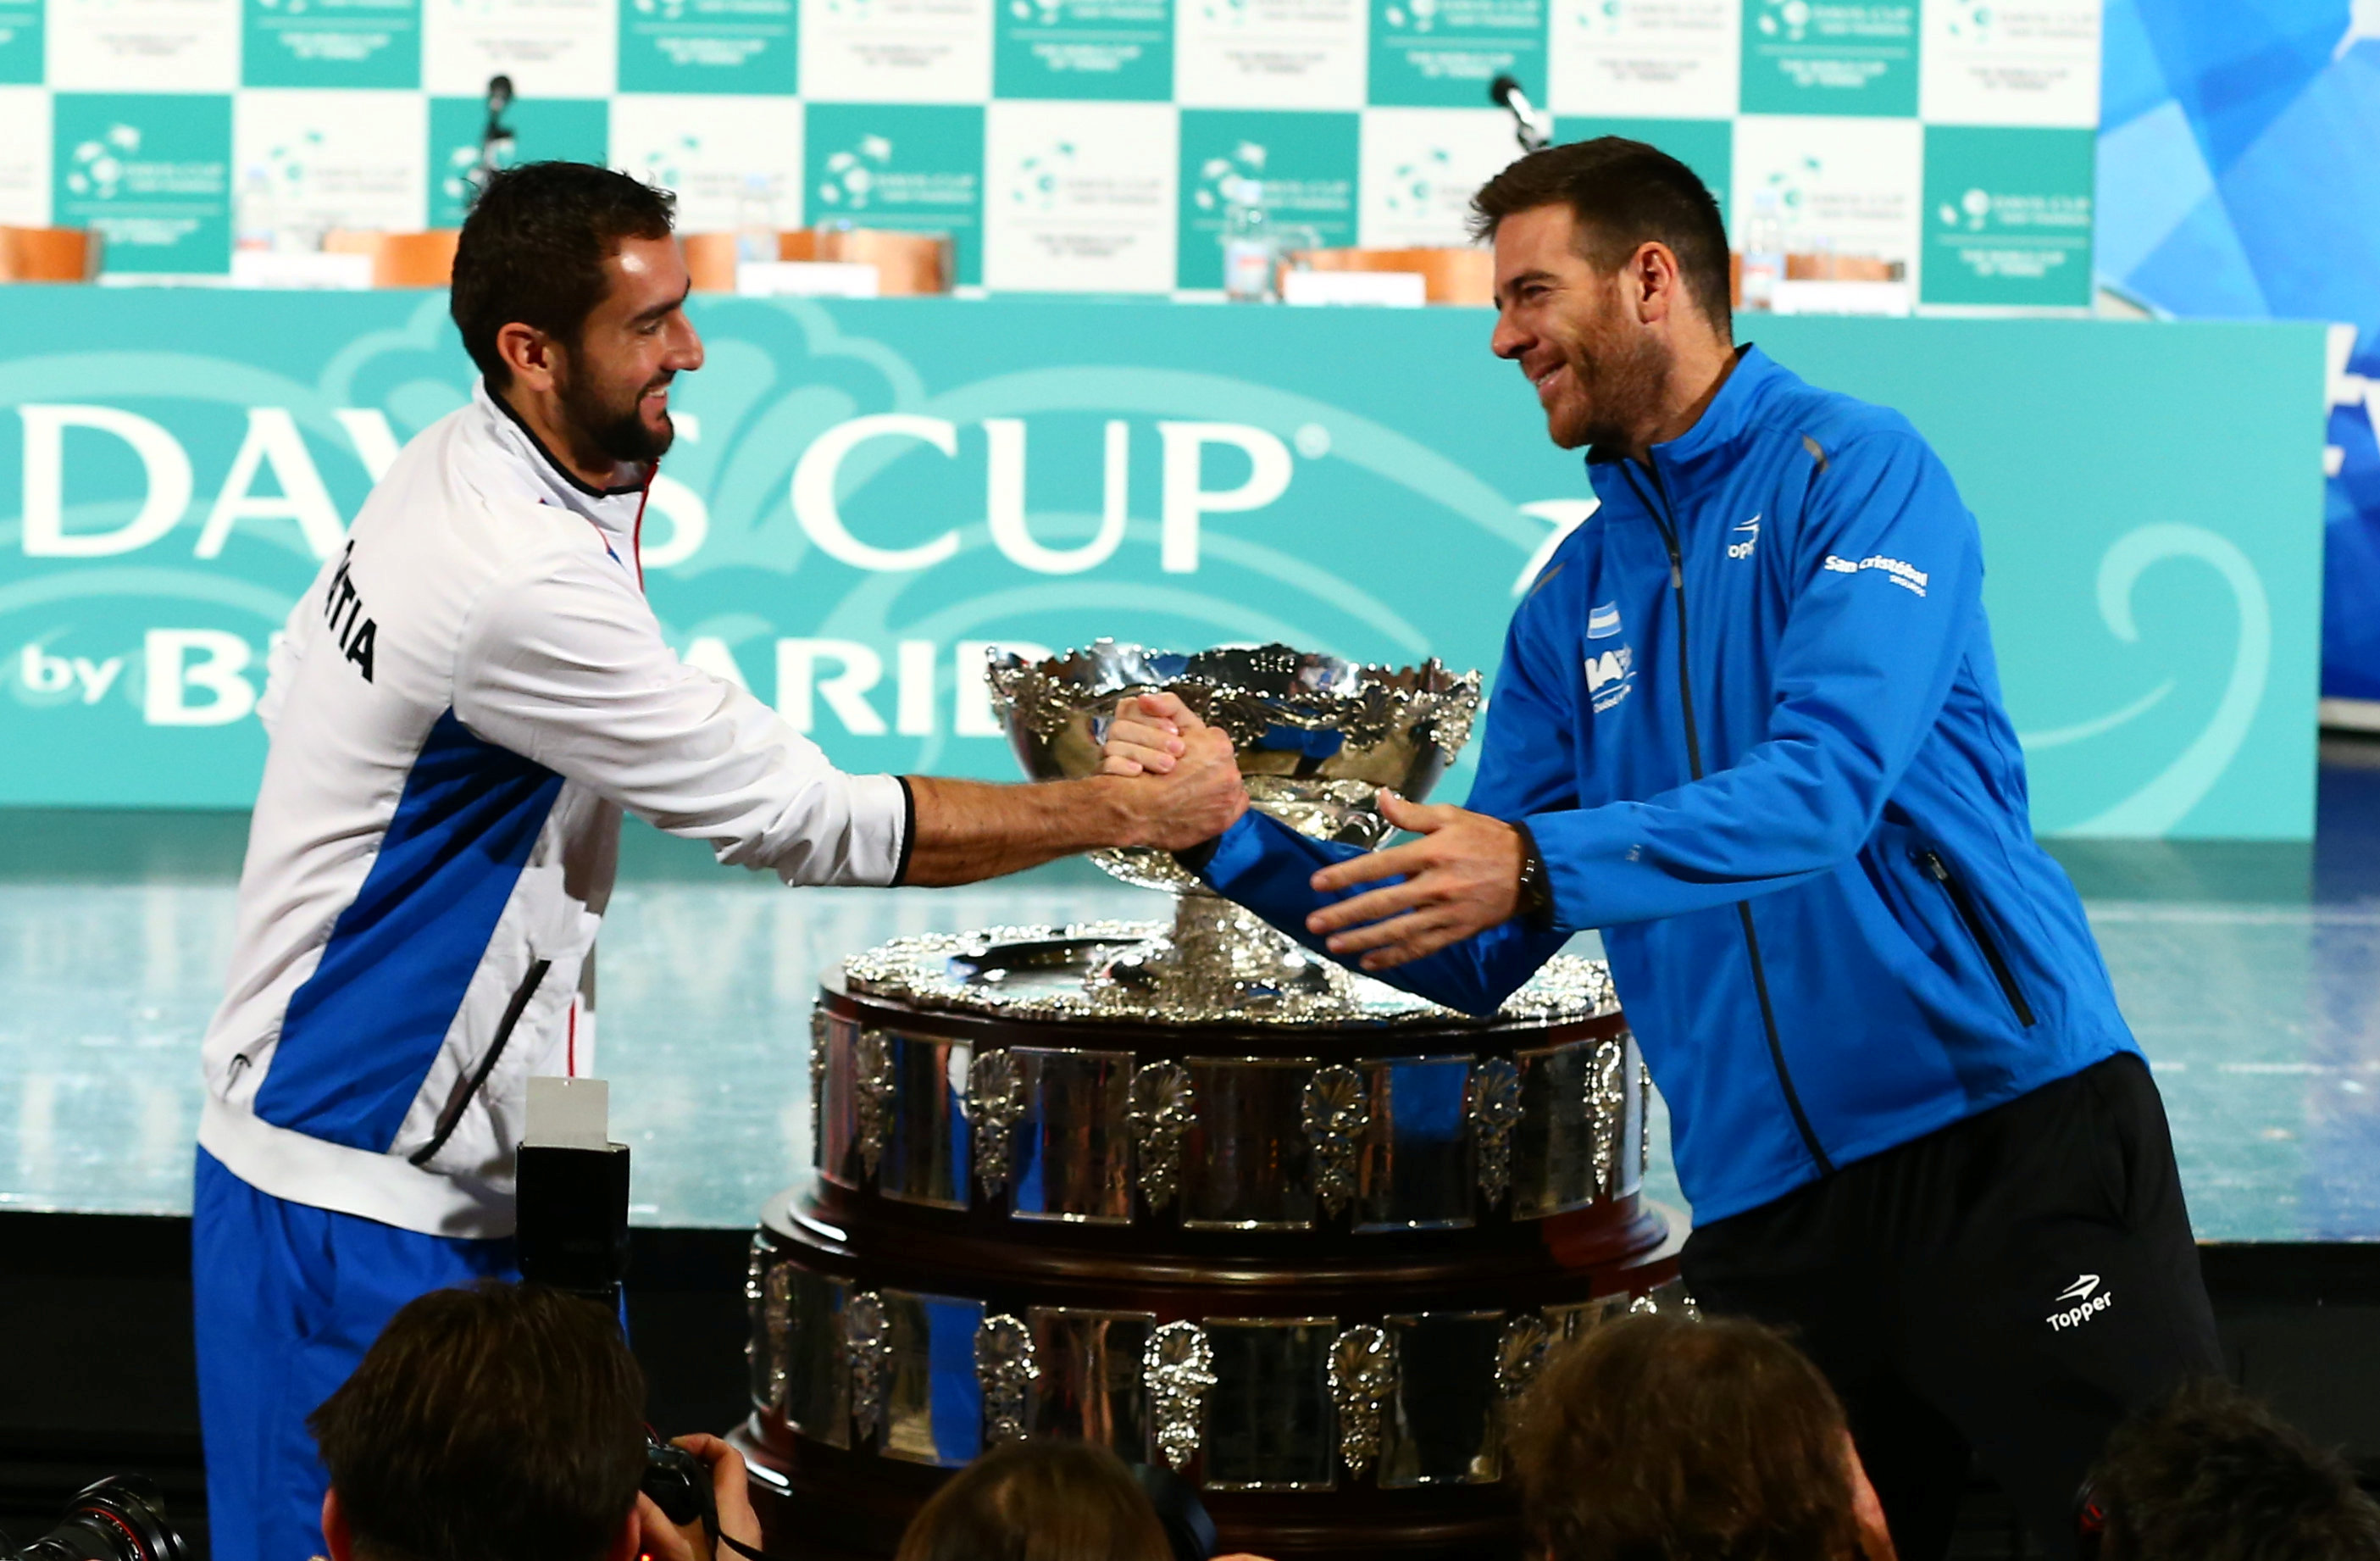 Tennis - Coupe Davis -  Coupe Davis : Cilic-Del Potro, un duel de gros bras